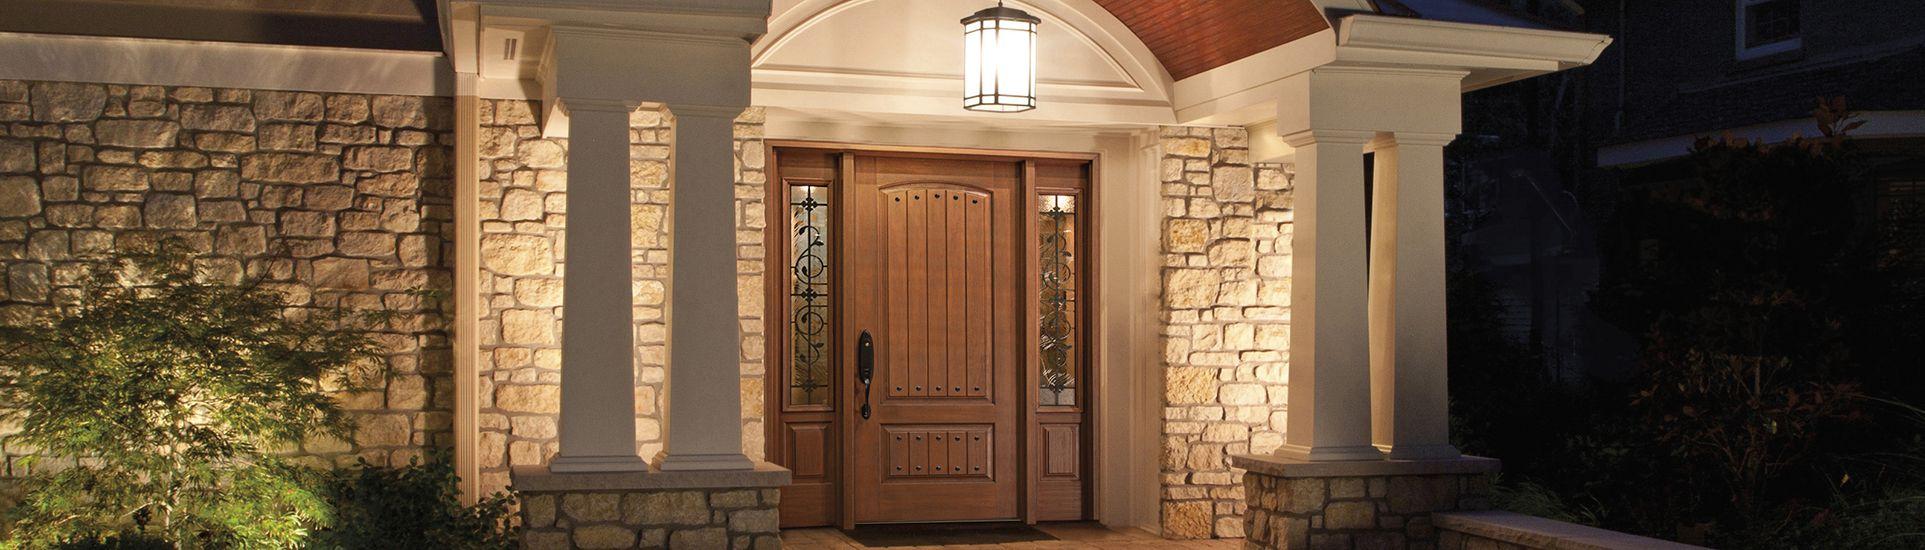 Clopay Entry Doors Denver Homes Businesses Affordable Door Co